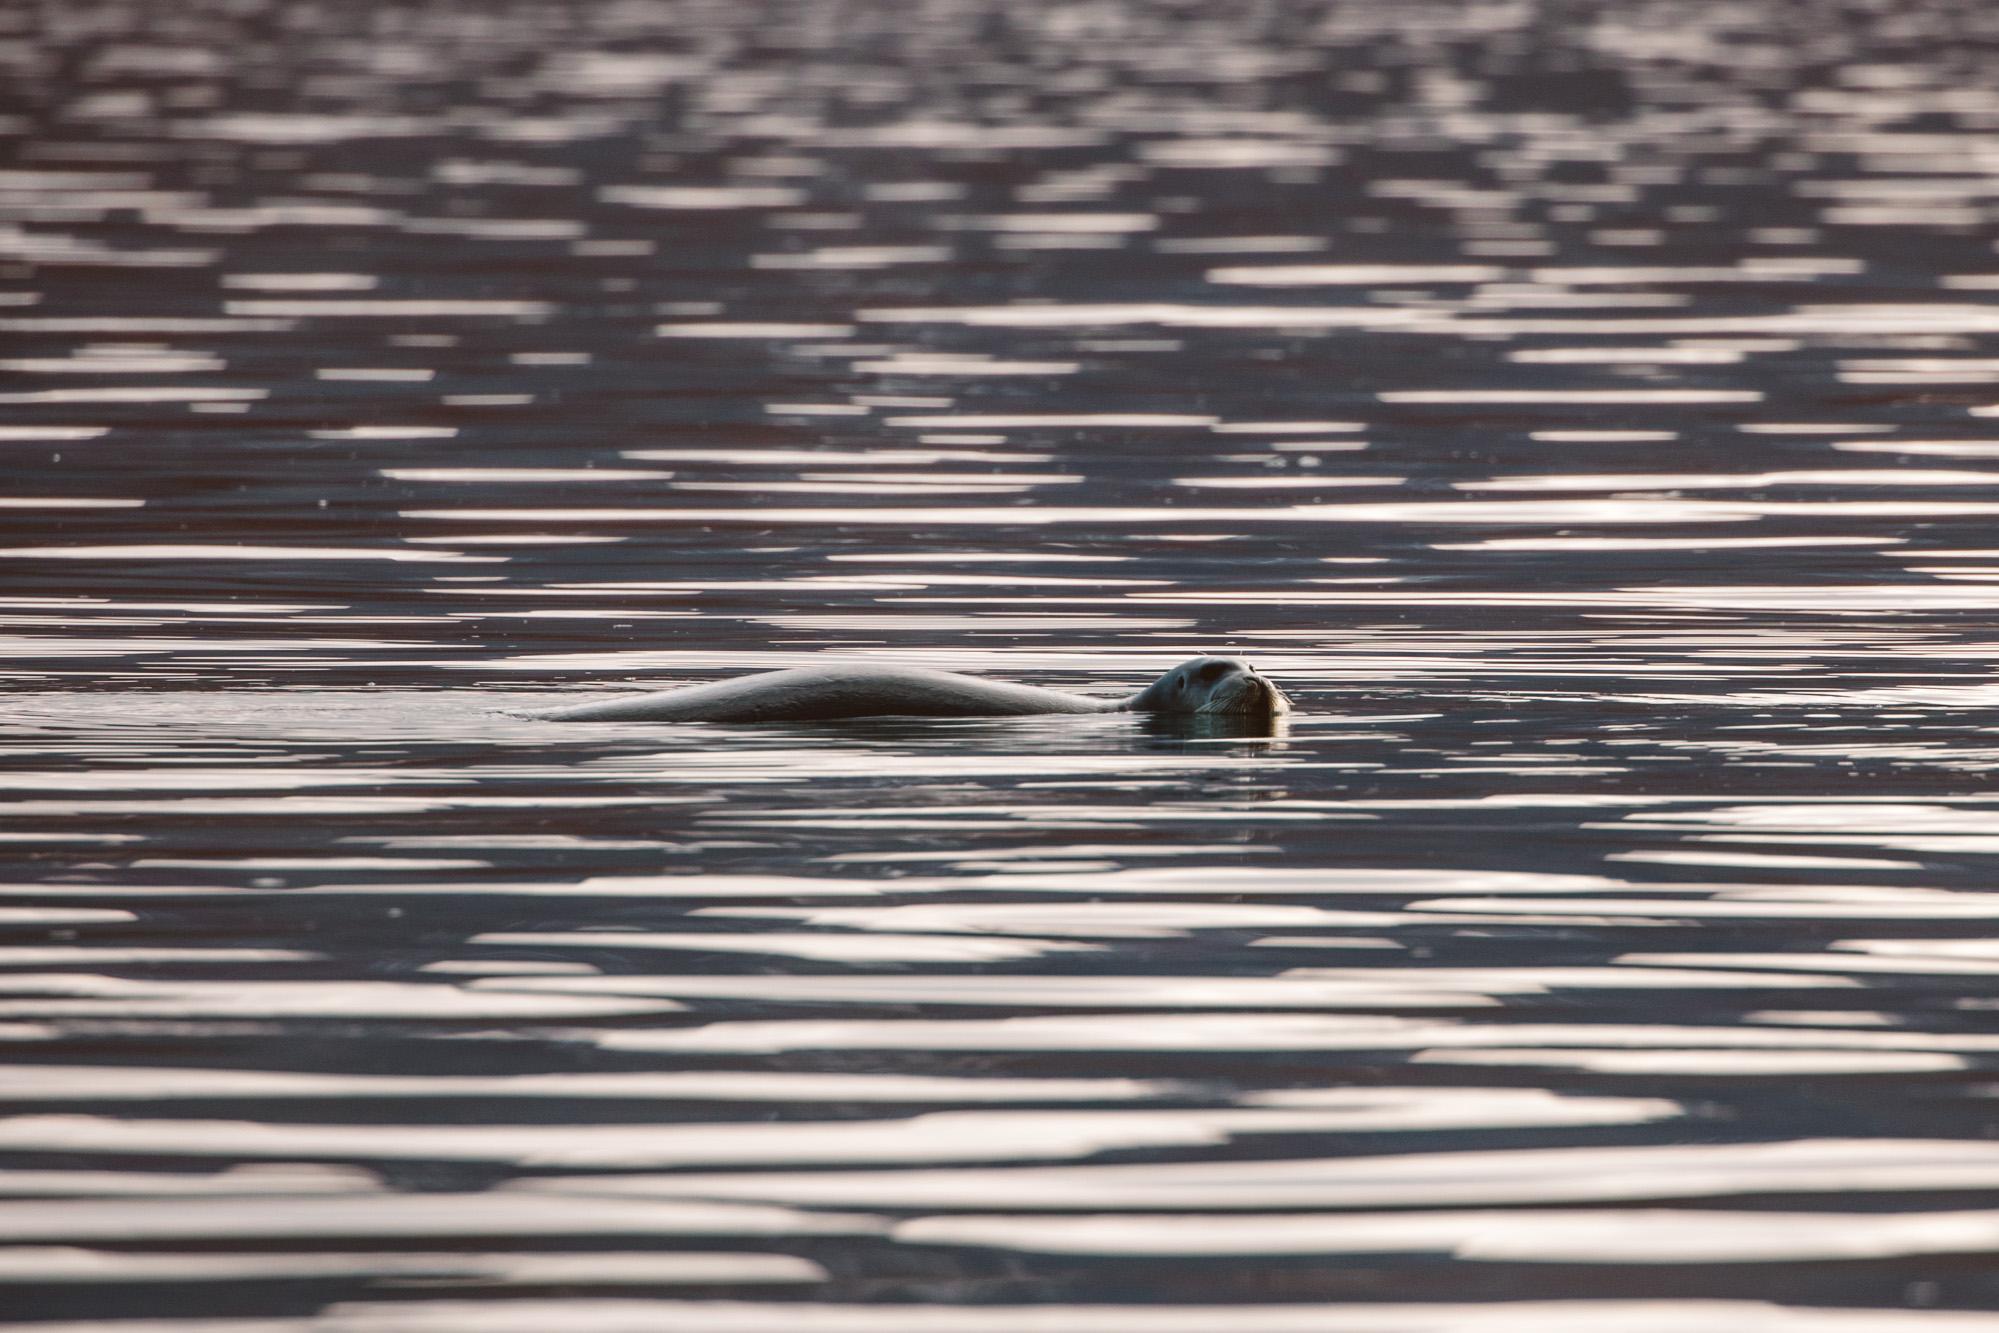 Seal in the water Spitsbergen, Svalbard, Norway